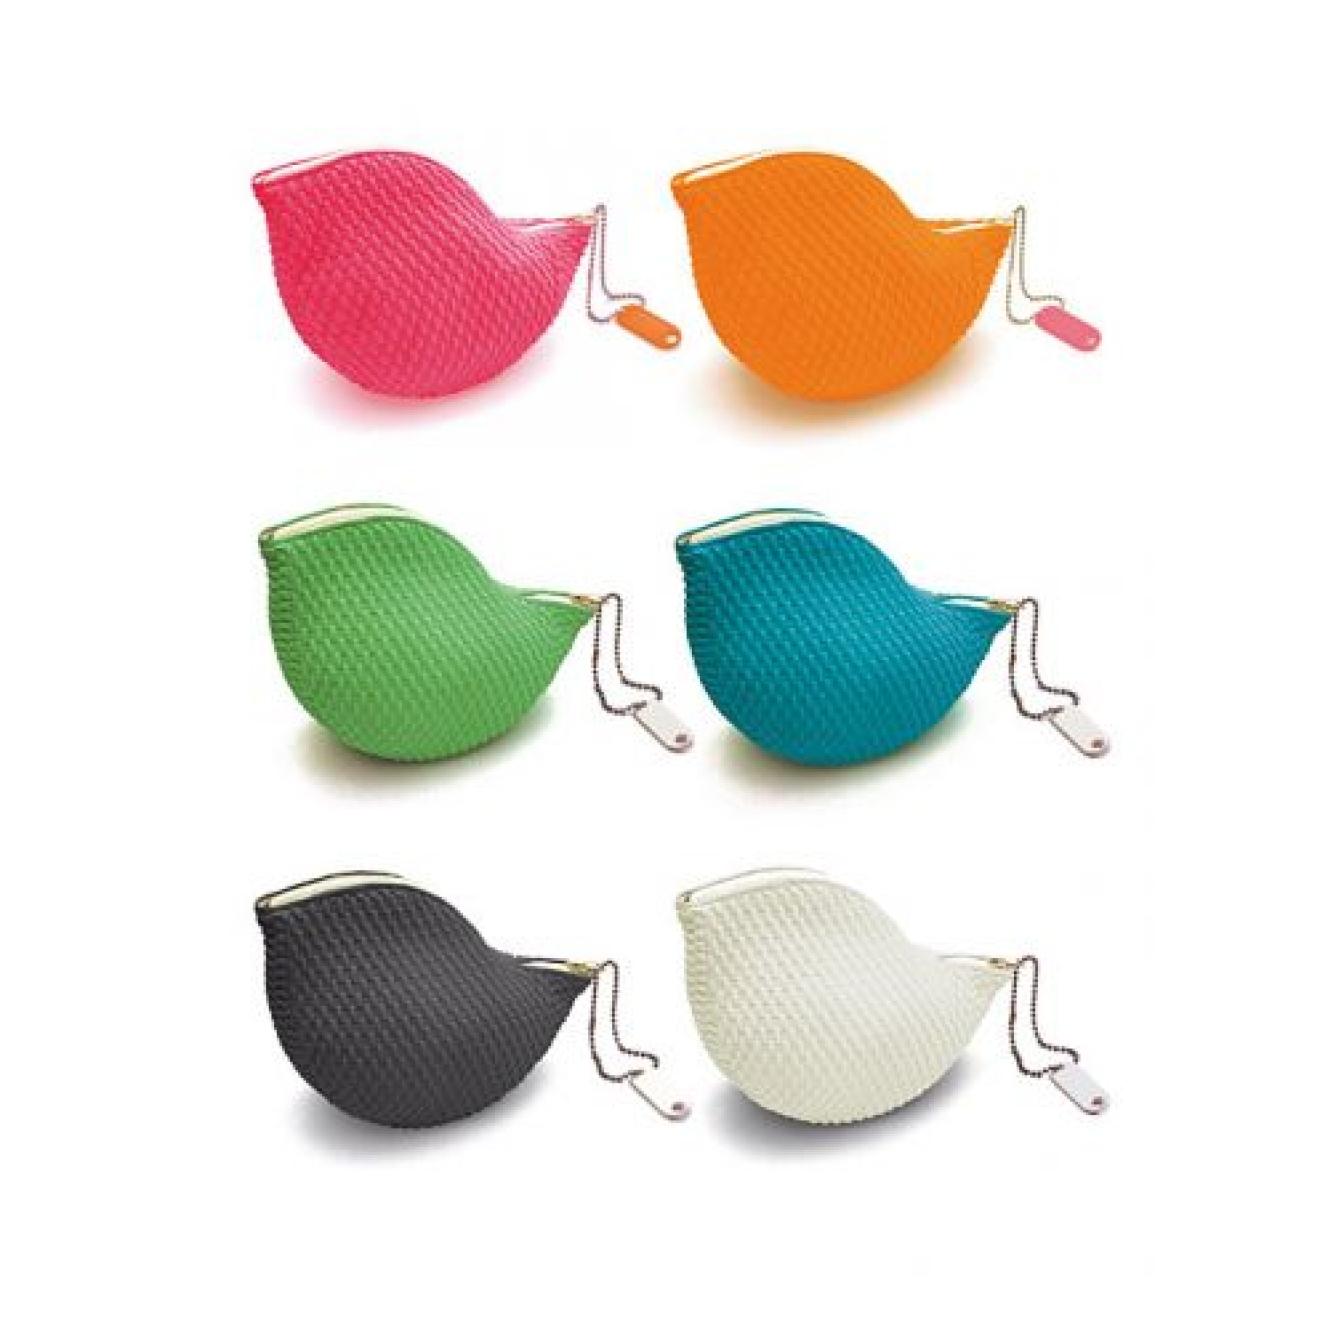 kulturbeutel aus gummi in form einer badekappe. Black Bedroom Furniture Sets. Home Design Ideas